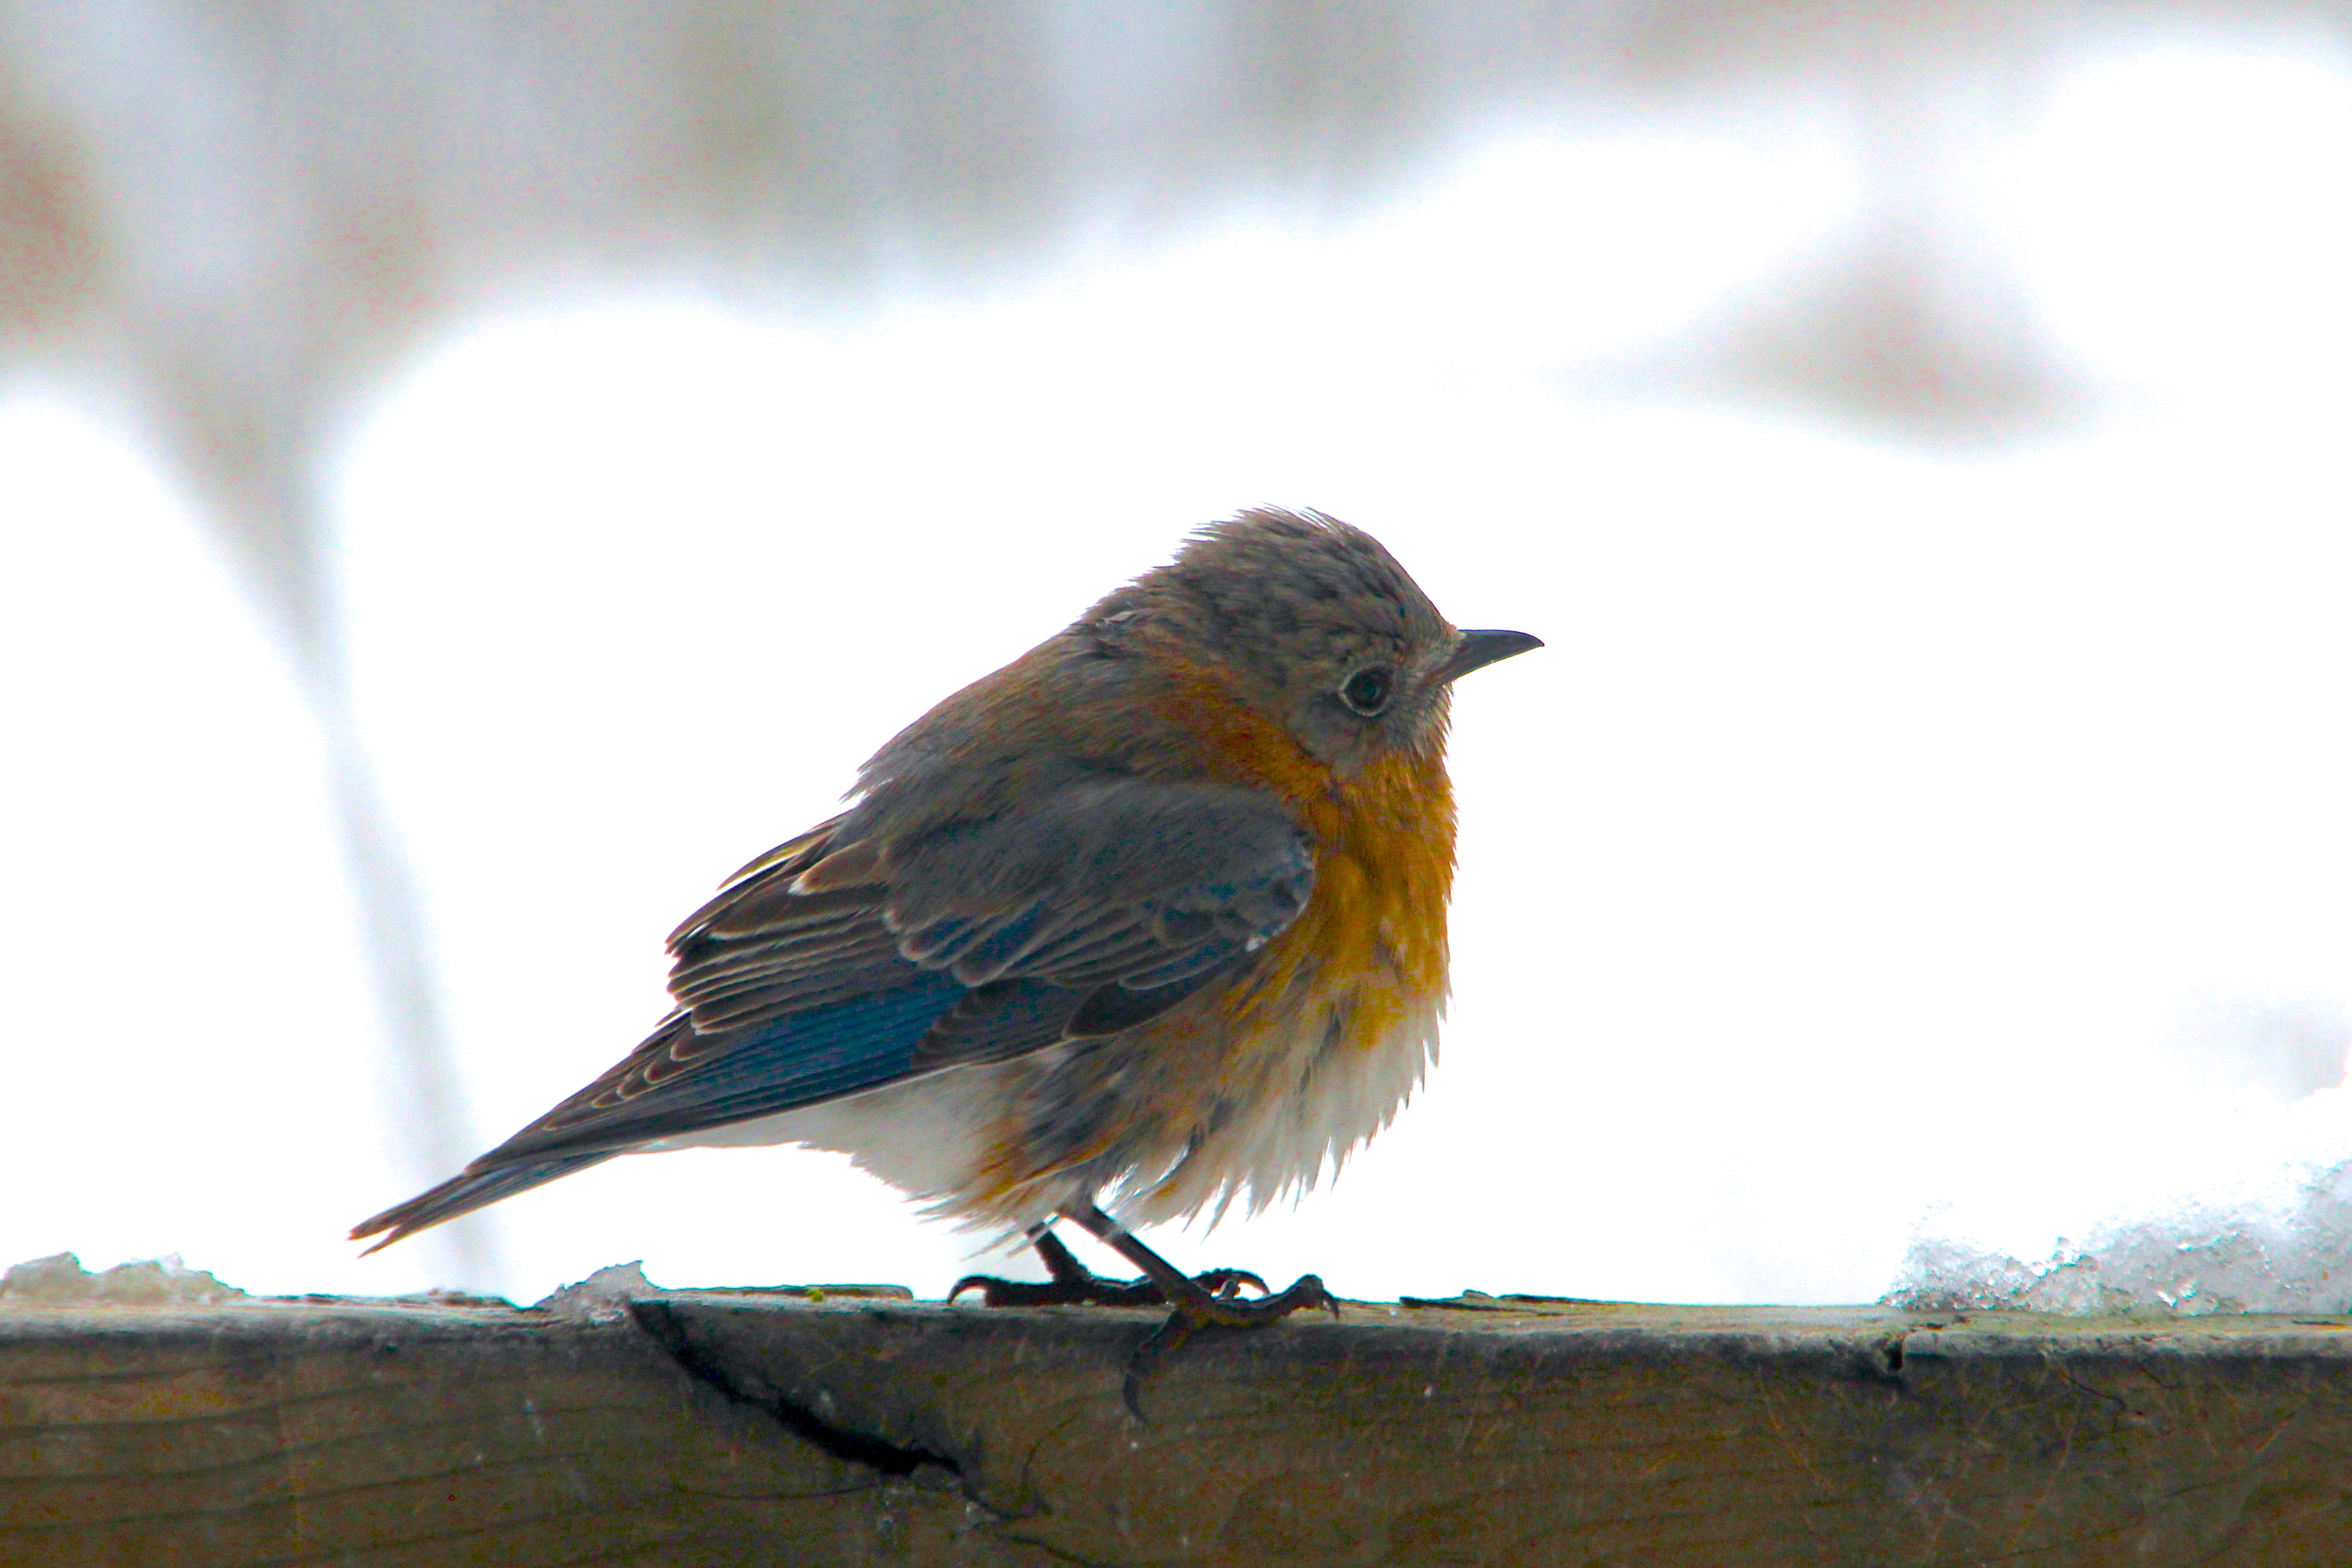 Bluebird fluffed to keep warm